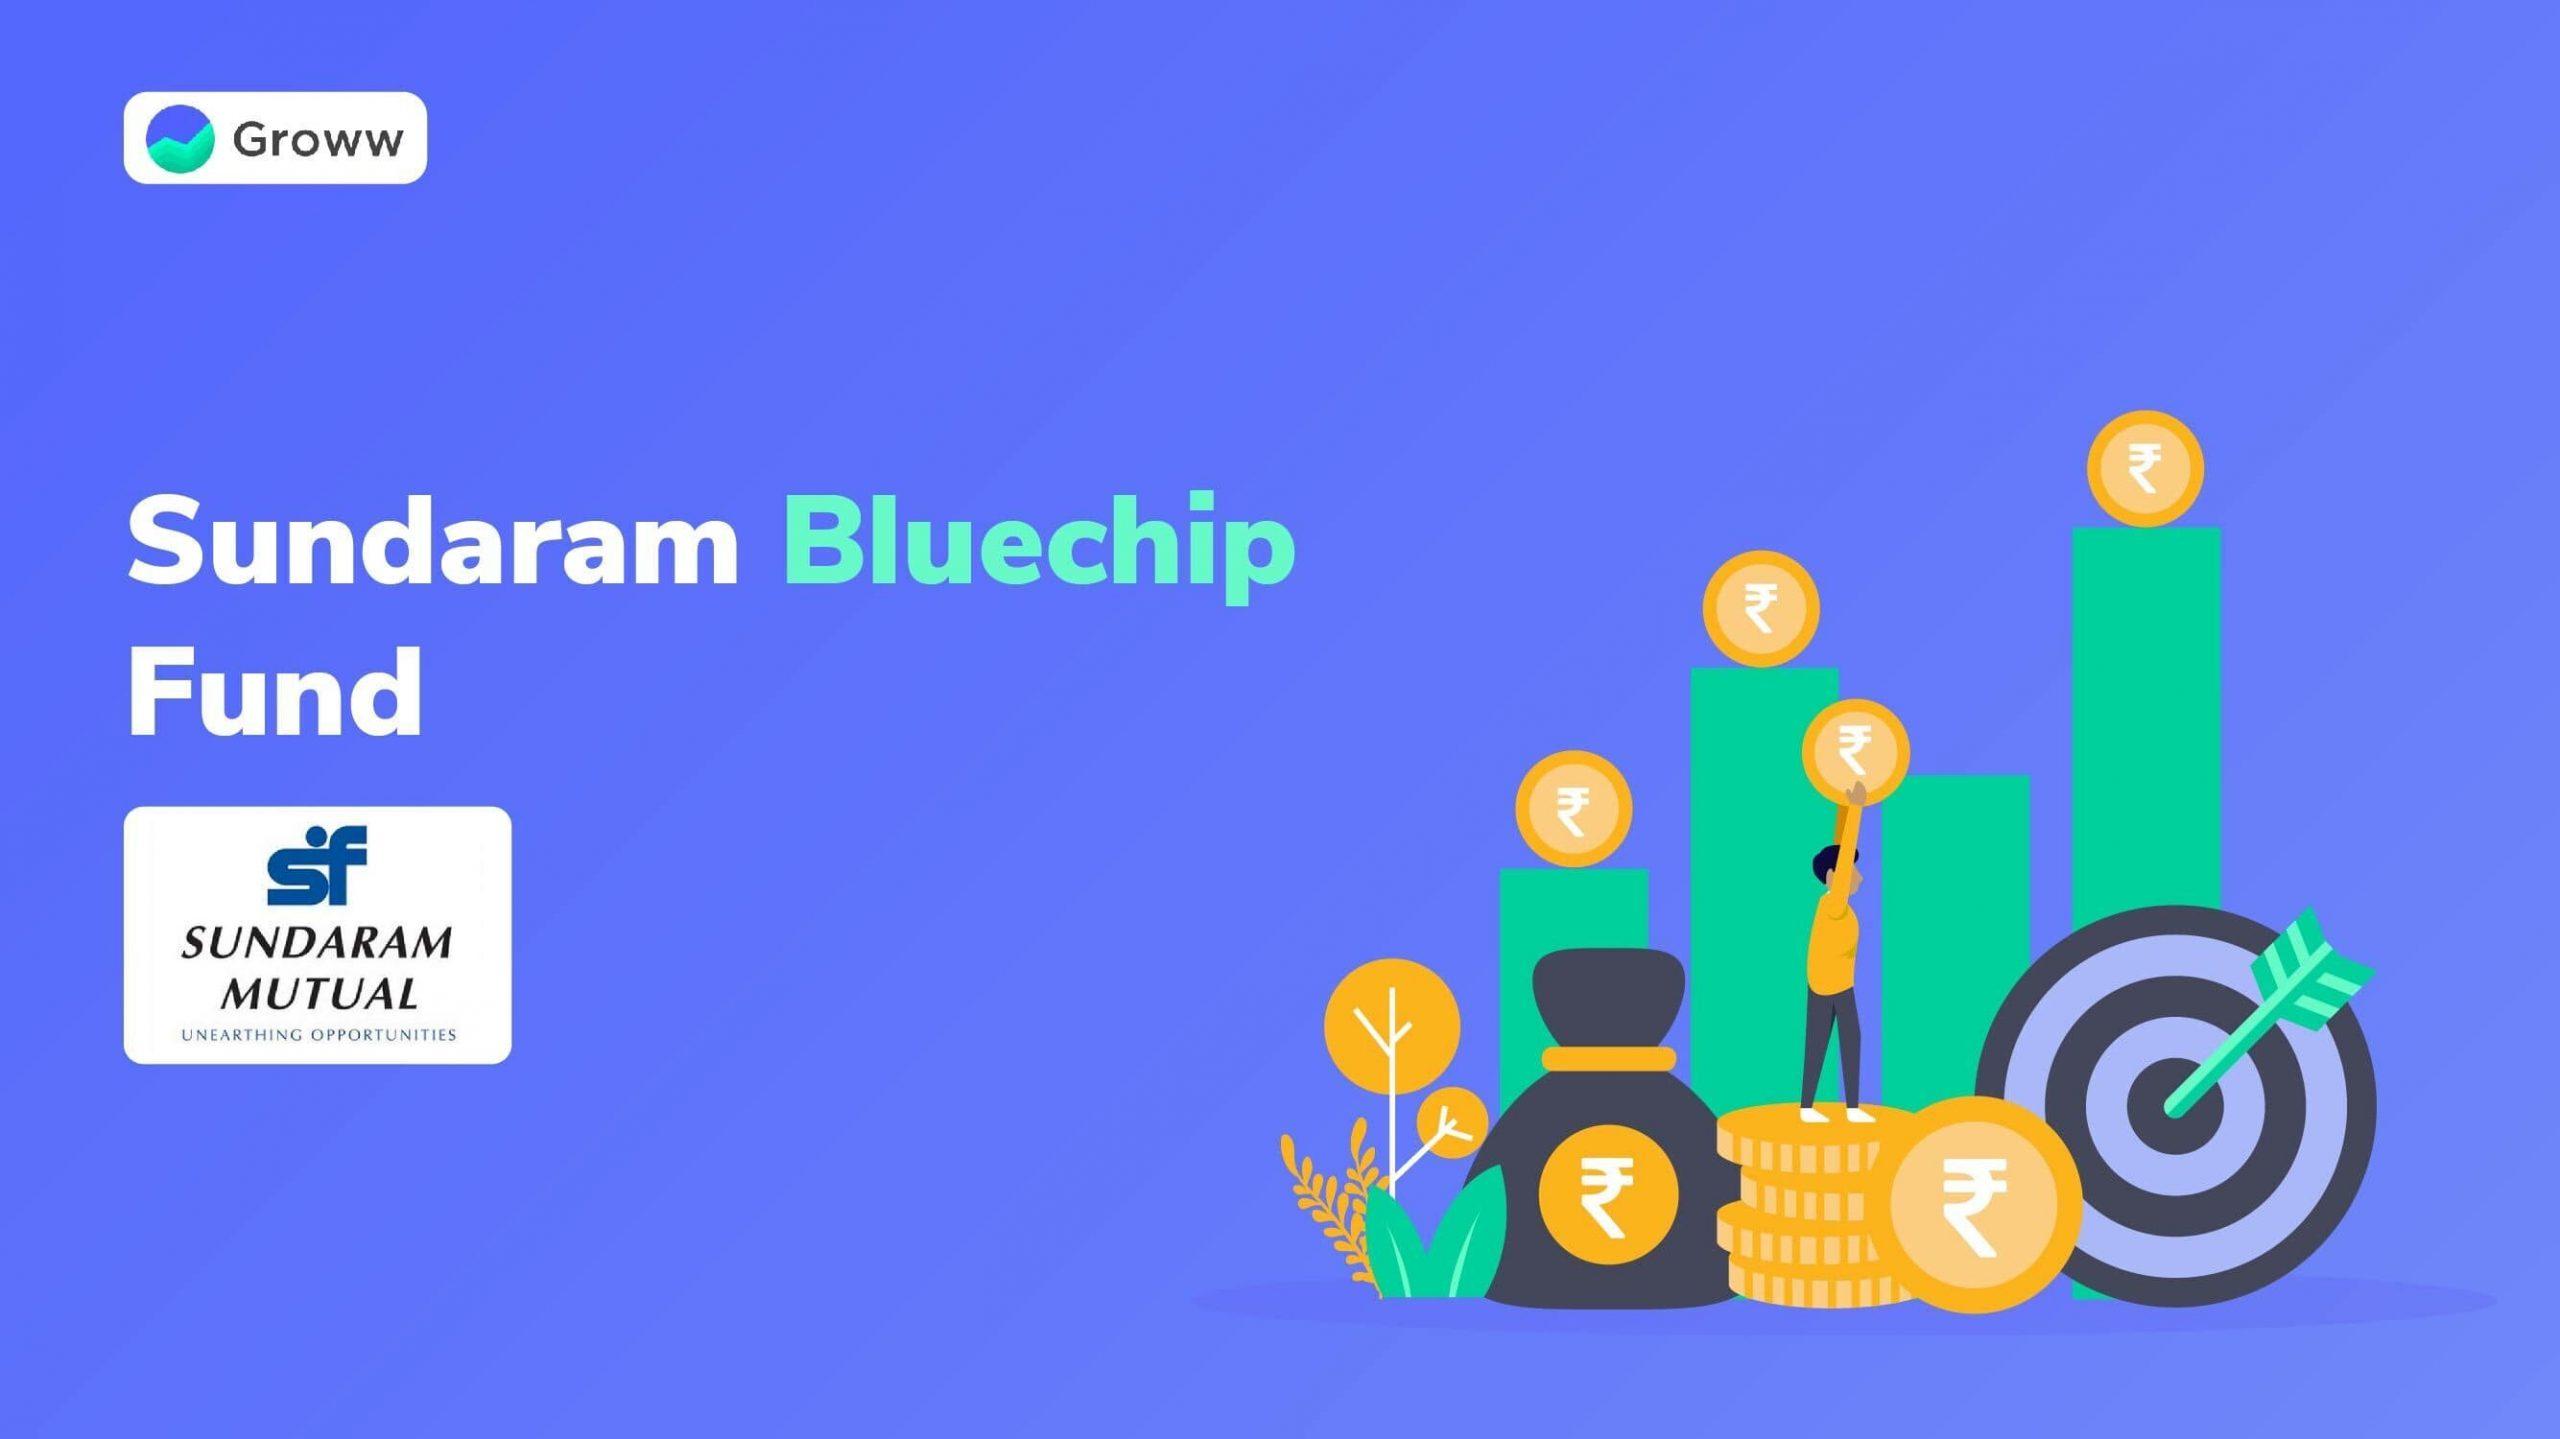 Sundaram Bluechip Fund NFO